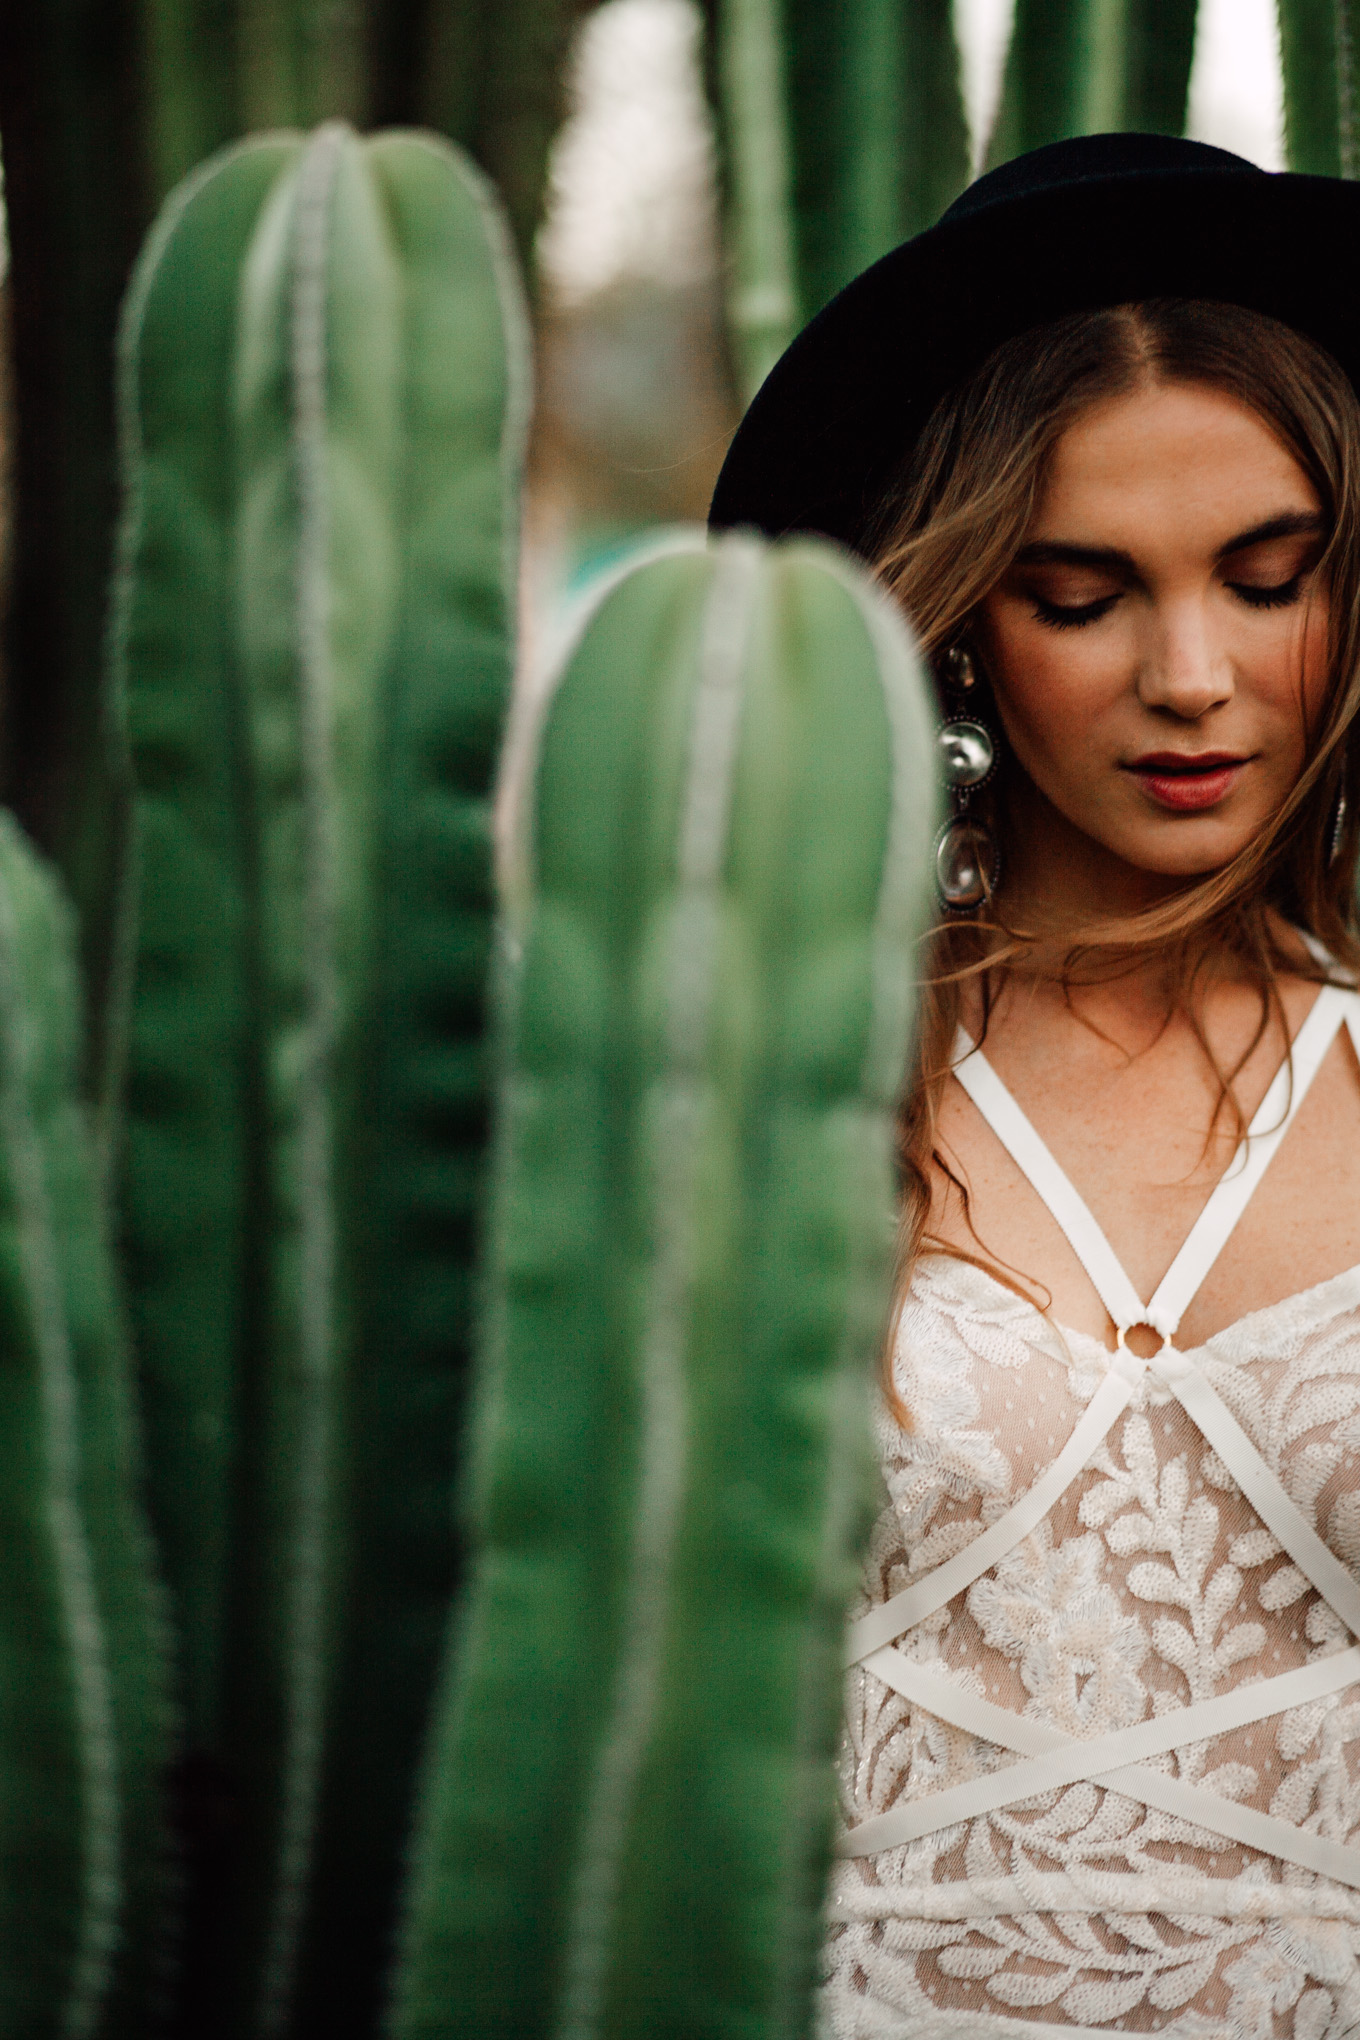 Cape-Town-Pia-Anna-Christian-Wedding-Photography-South-Africa-Bride-Cactus-23.jpg